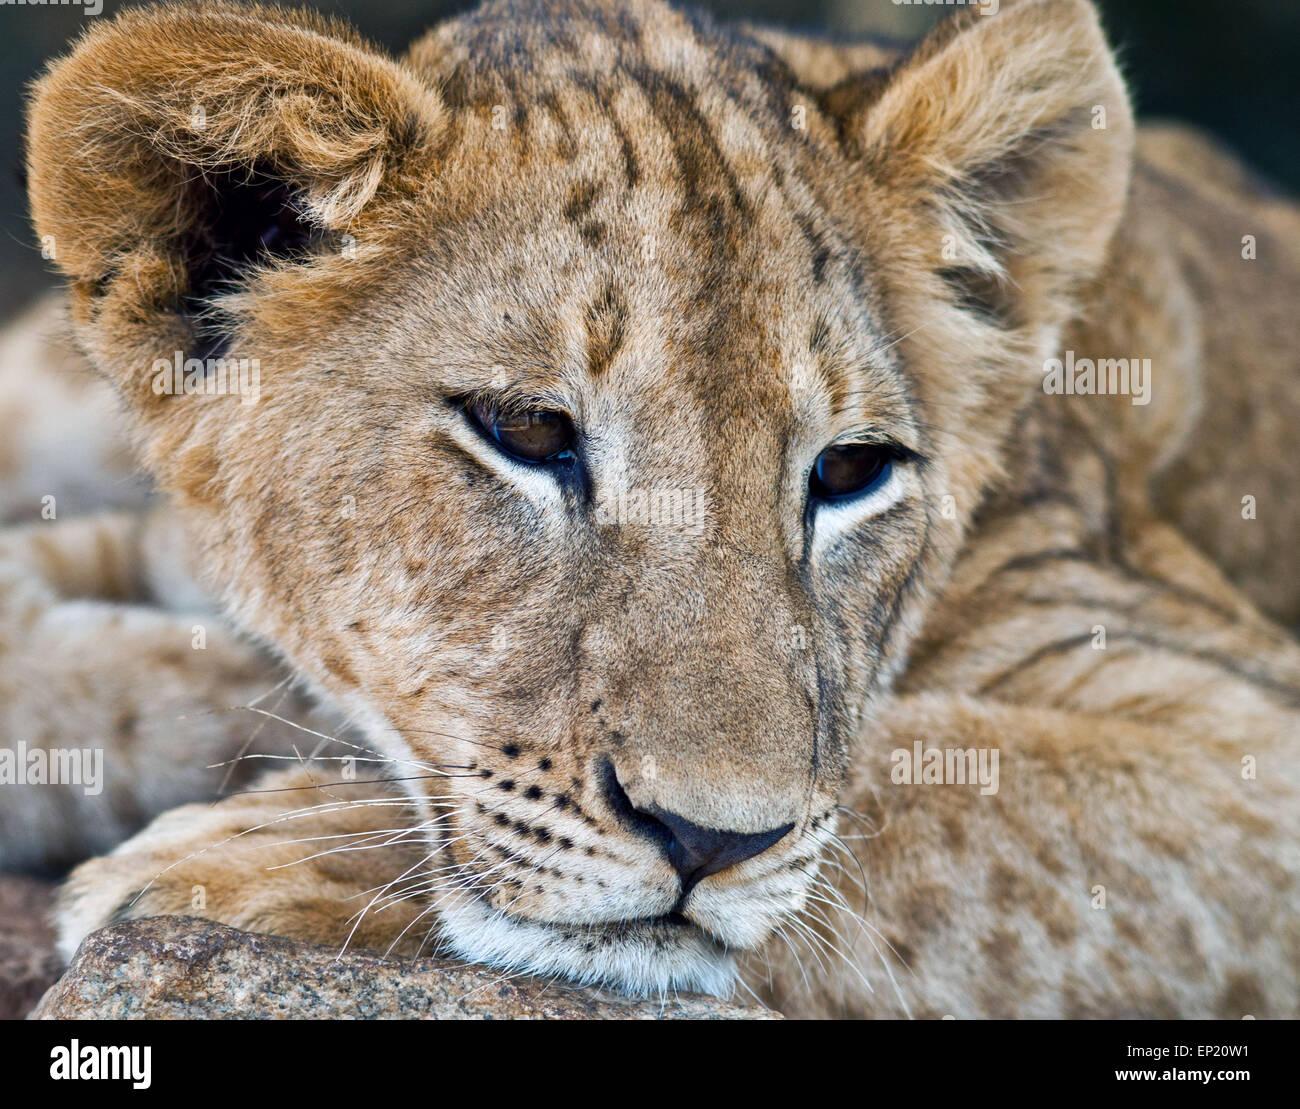 Portrait of a Lion cub, South Africa - Stock Image